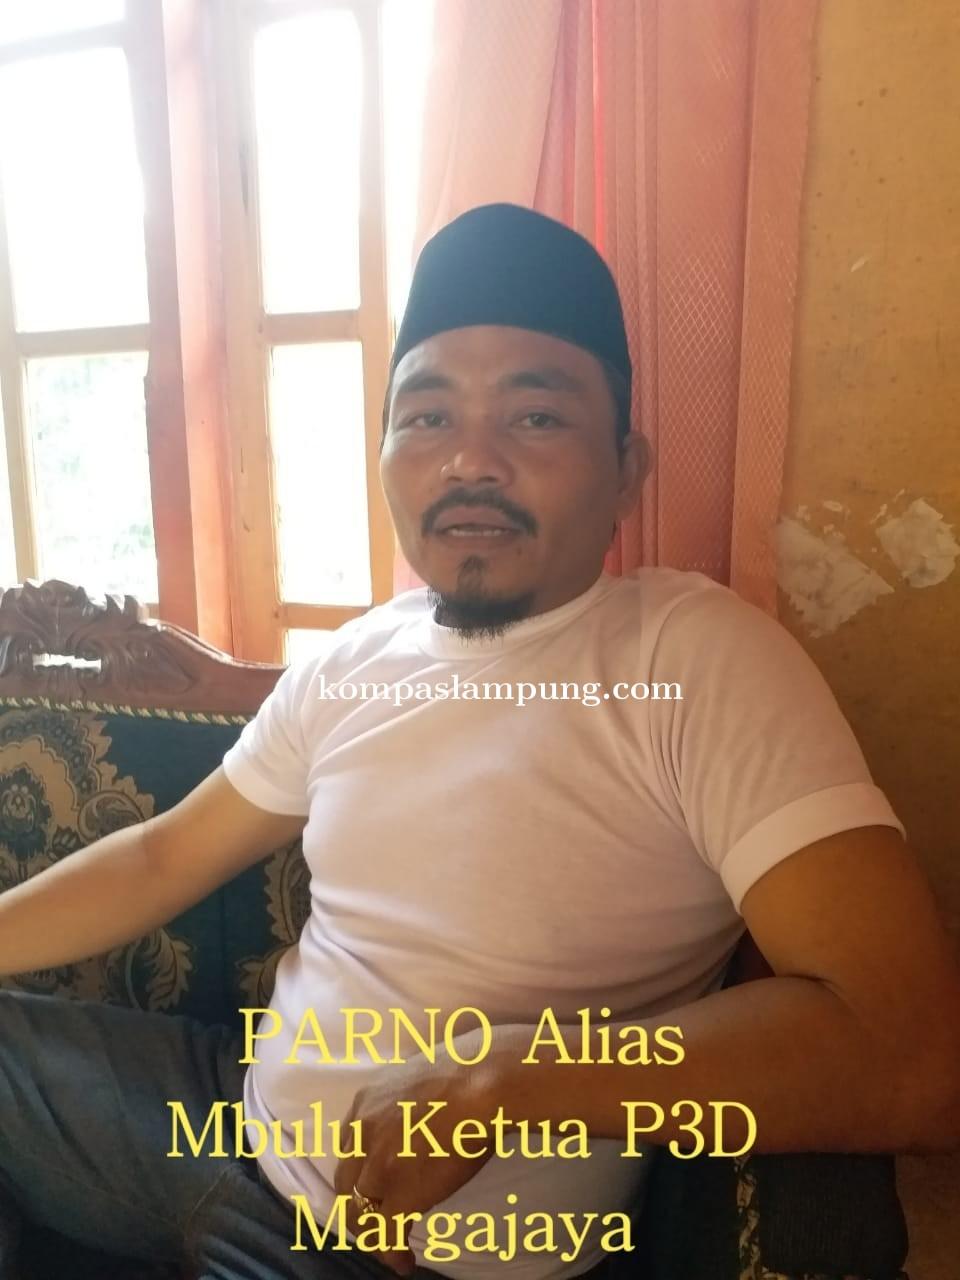 Ketua P3D Margajaya Bantah Adanya Pengondisian Peserta Calon Kaur